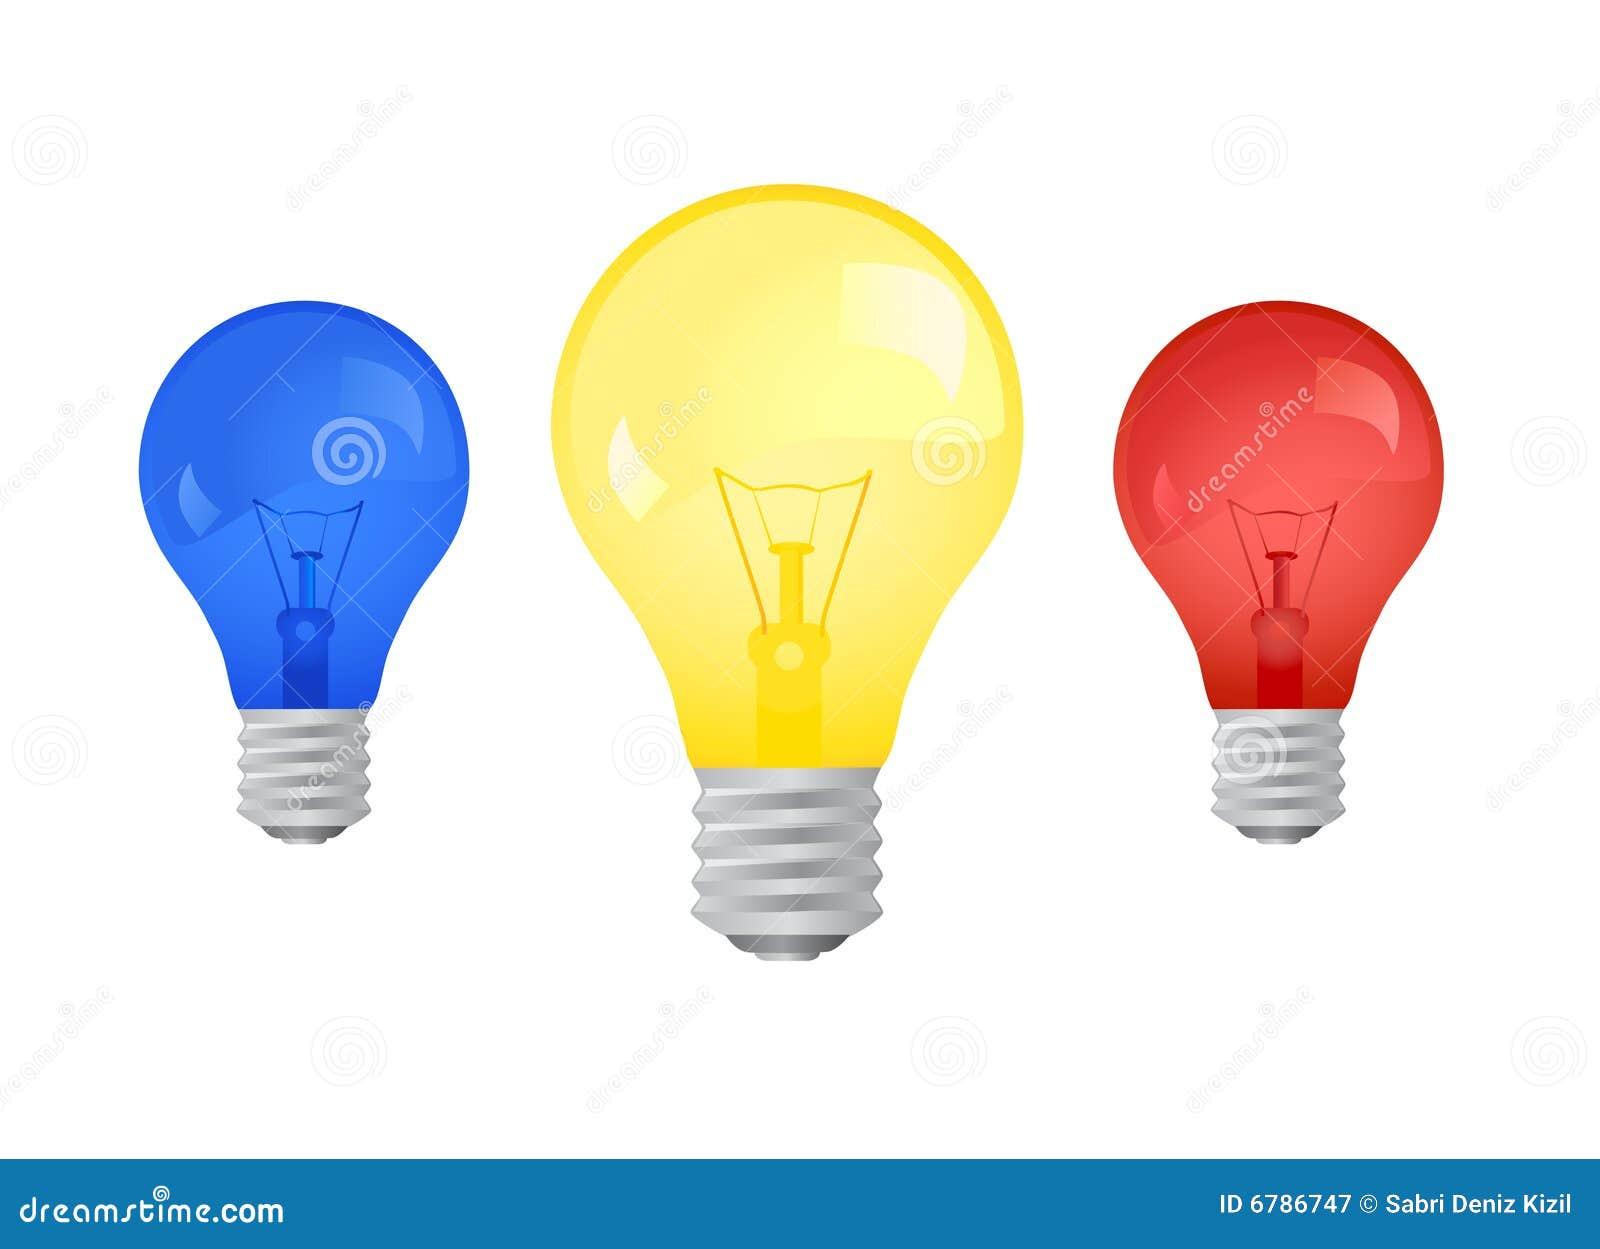 light bulb vector stock vector illustration of colors 6786747. Black Bedroom Furniture Sets. Home Design Ideas